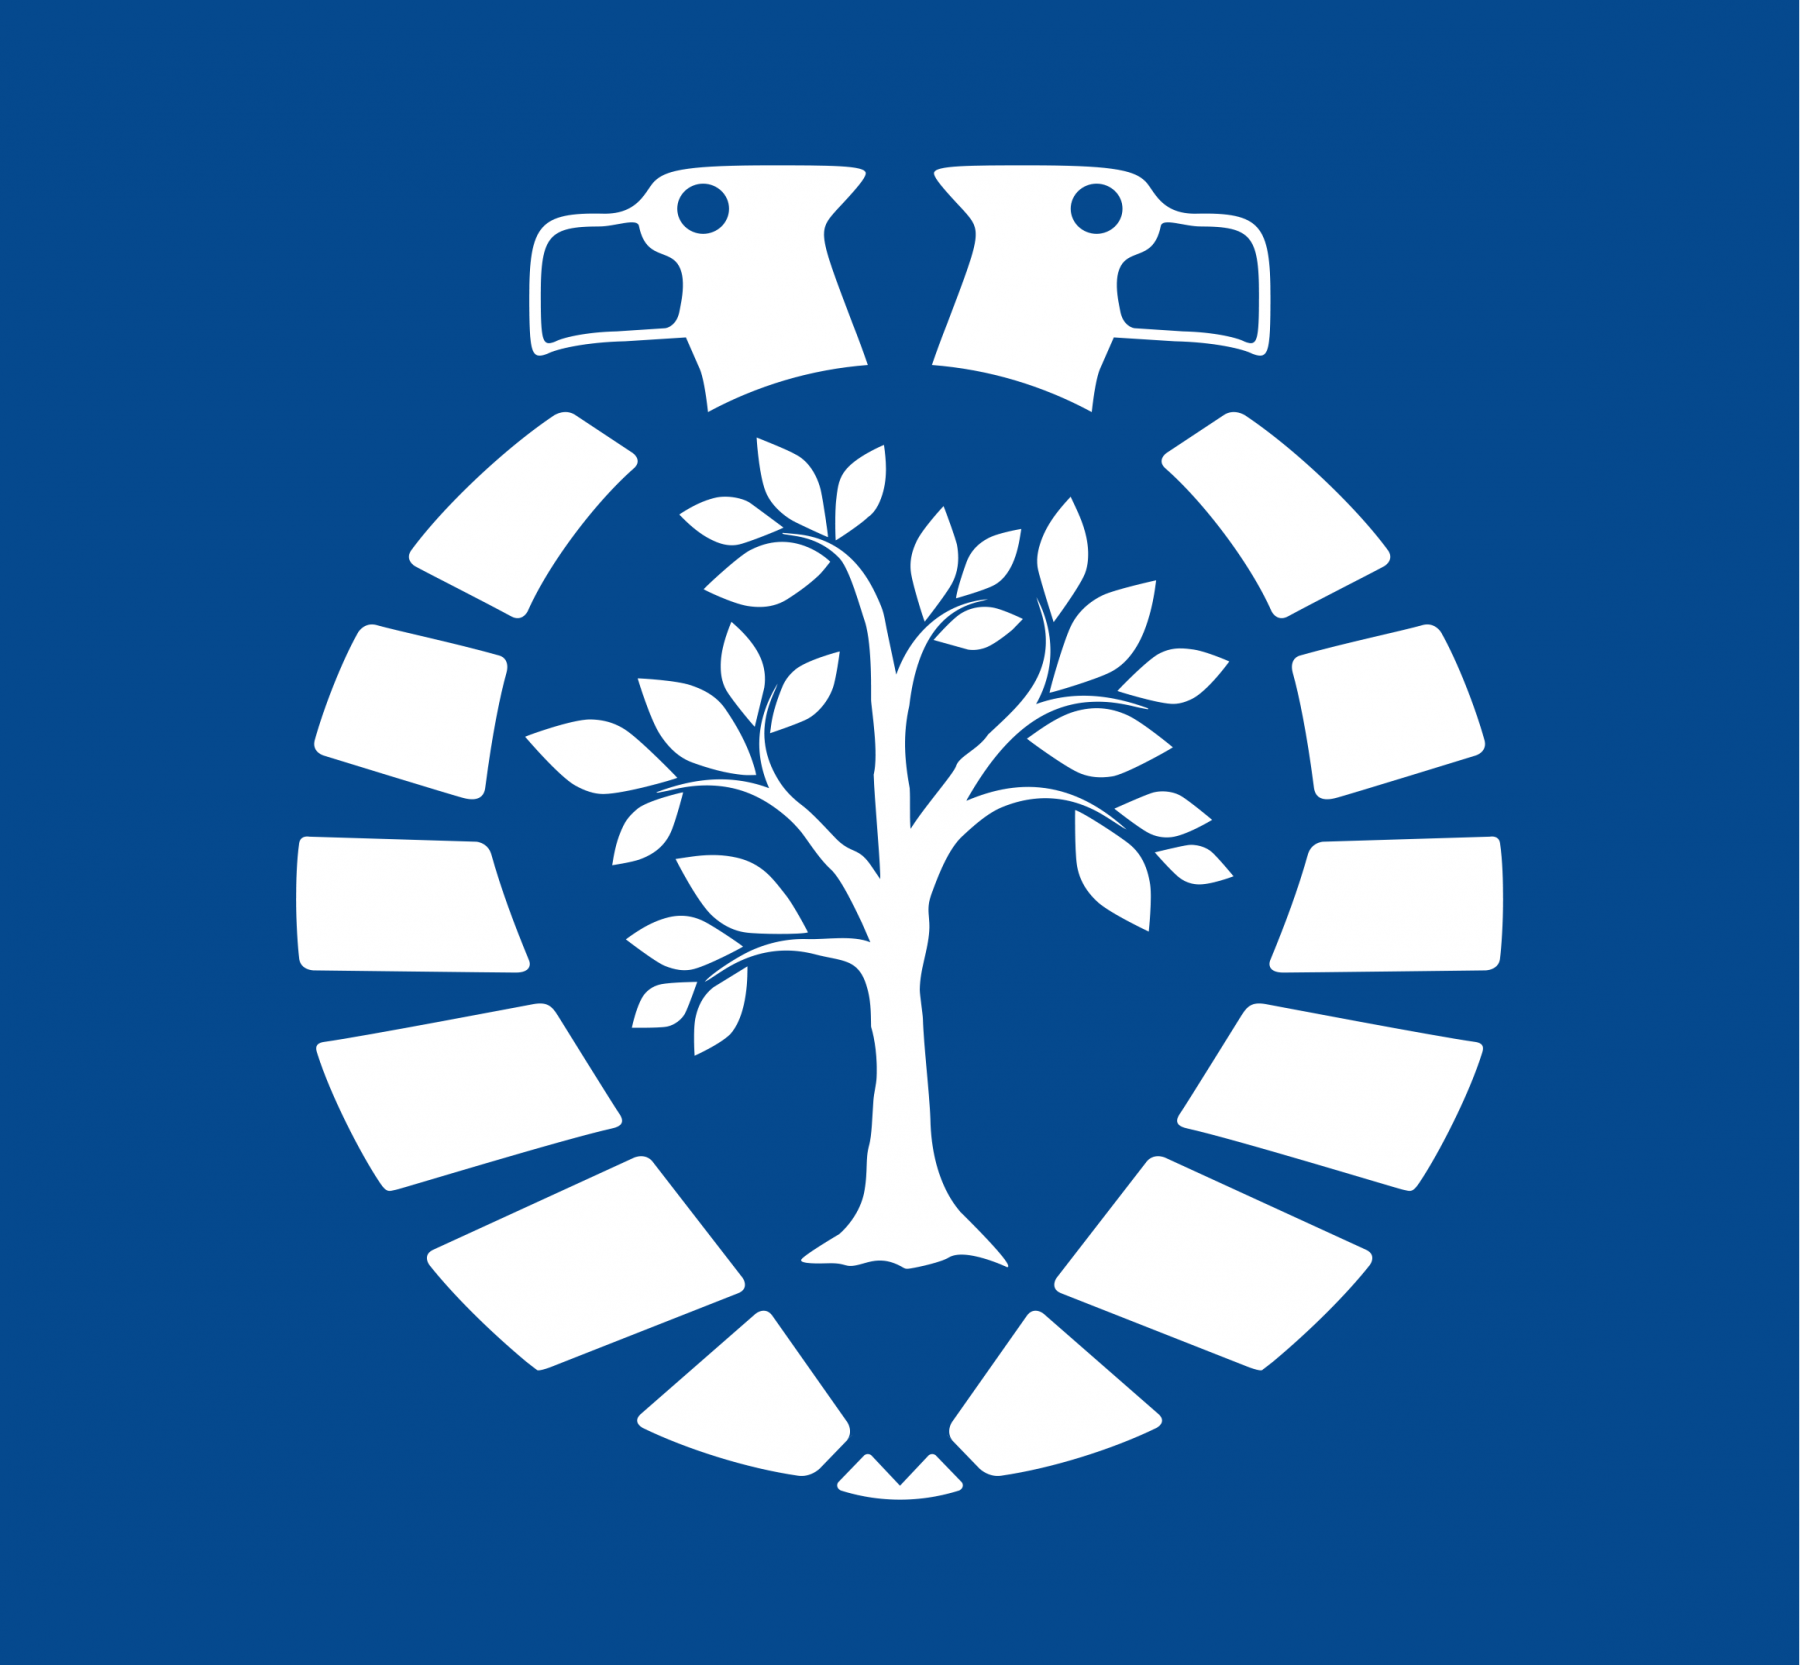 Arnhem Klimaatbestendig gemeente arnhem klimaat grafisch ontwerp dana dijkgraaf DDD logo